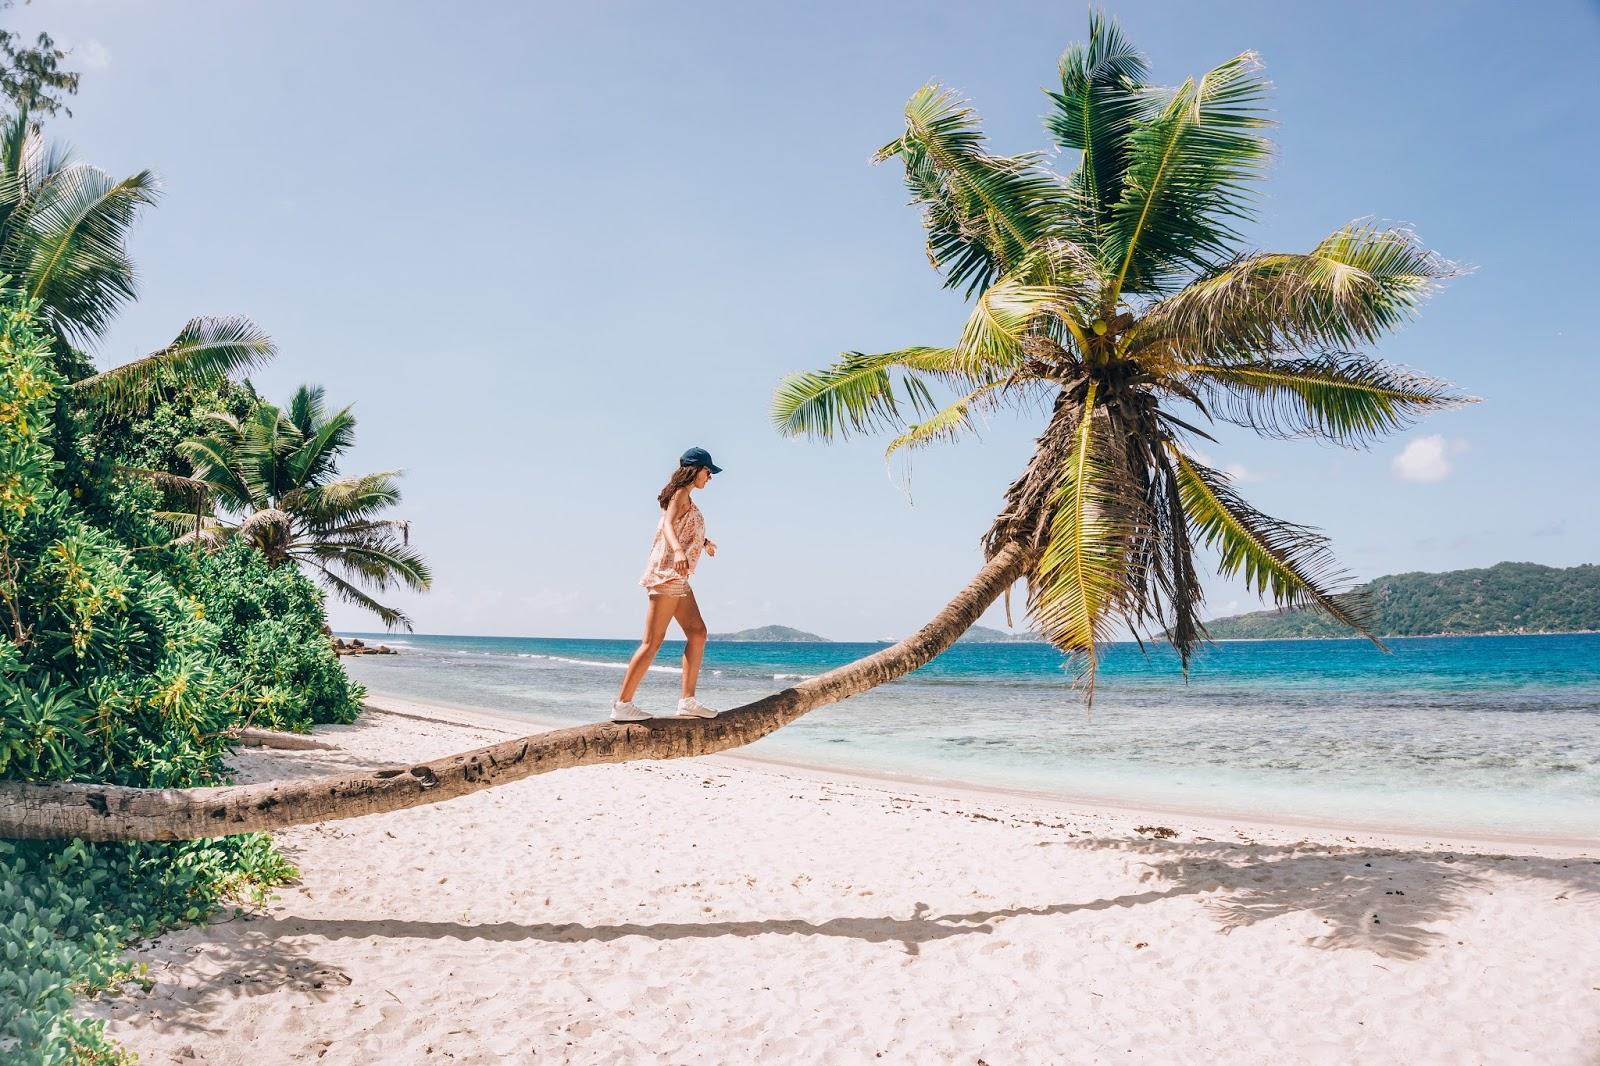 travel blog, Seychelles, Seychelles island, palm tree, Seychelles travel, travel cost to Seychelles, lifestyle blog, travel blog, thedailywonders, polishgirl, travel girl